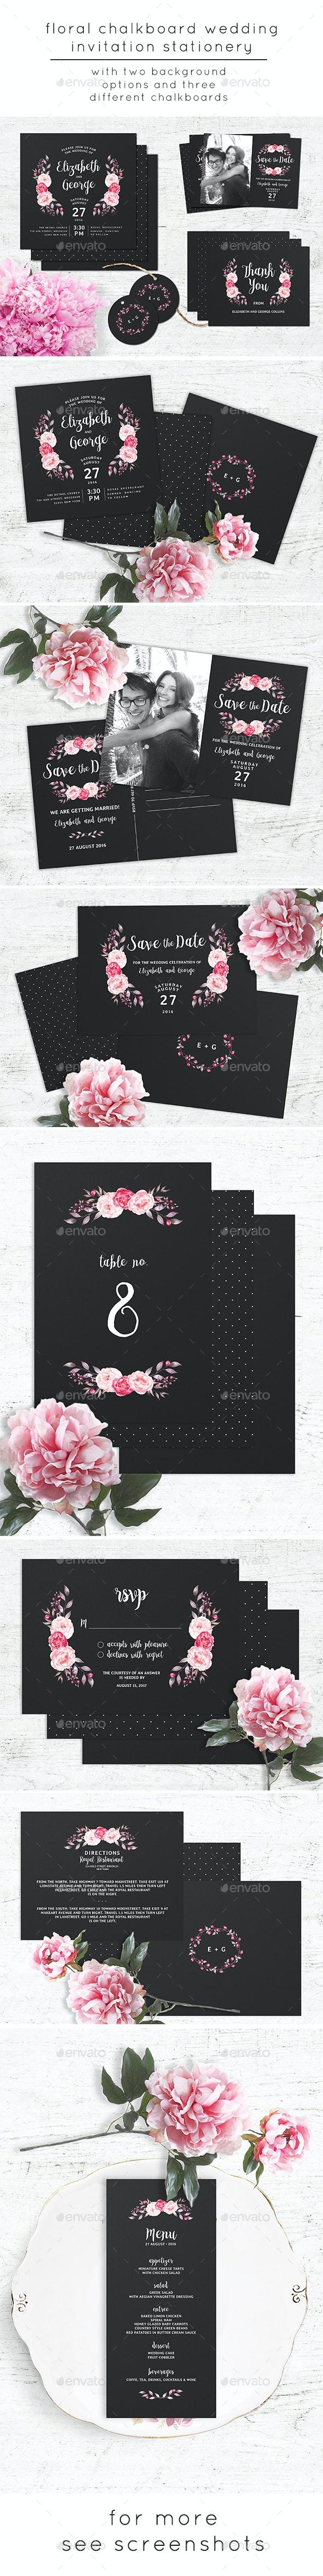 Chalkboard Wedding Invitation Stationery - Weddings Cards & Invites